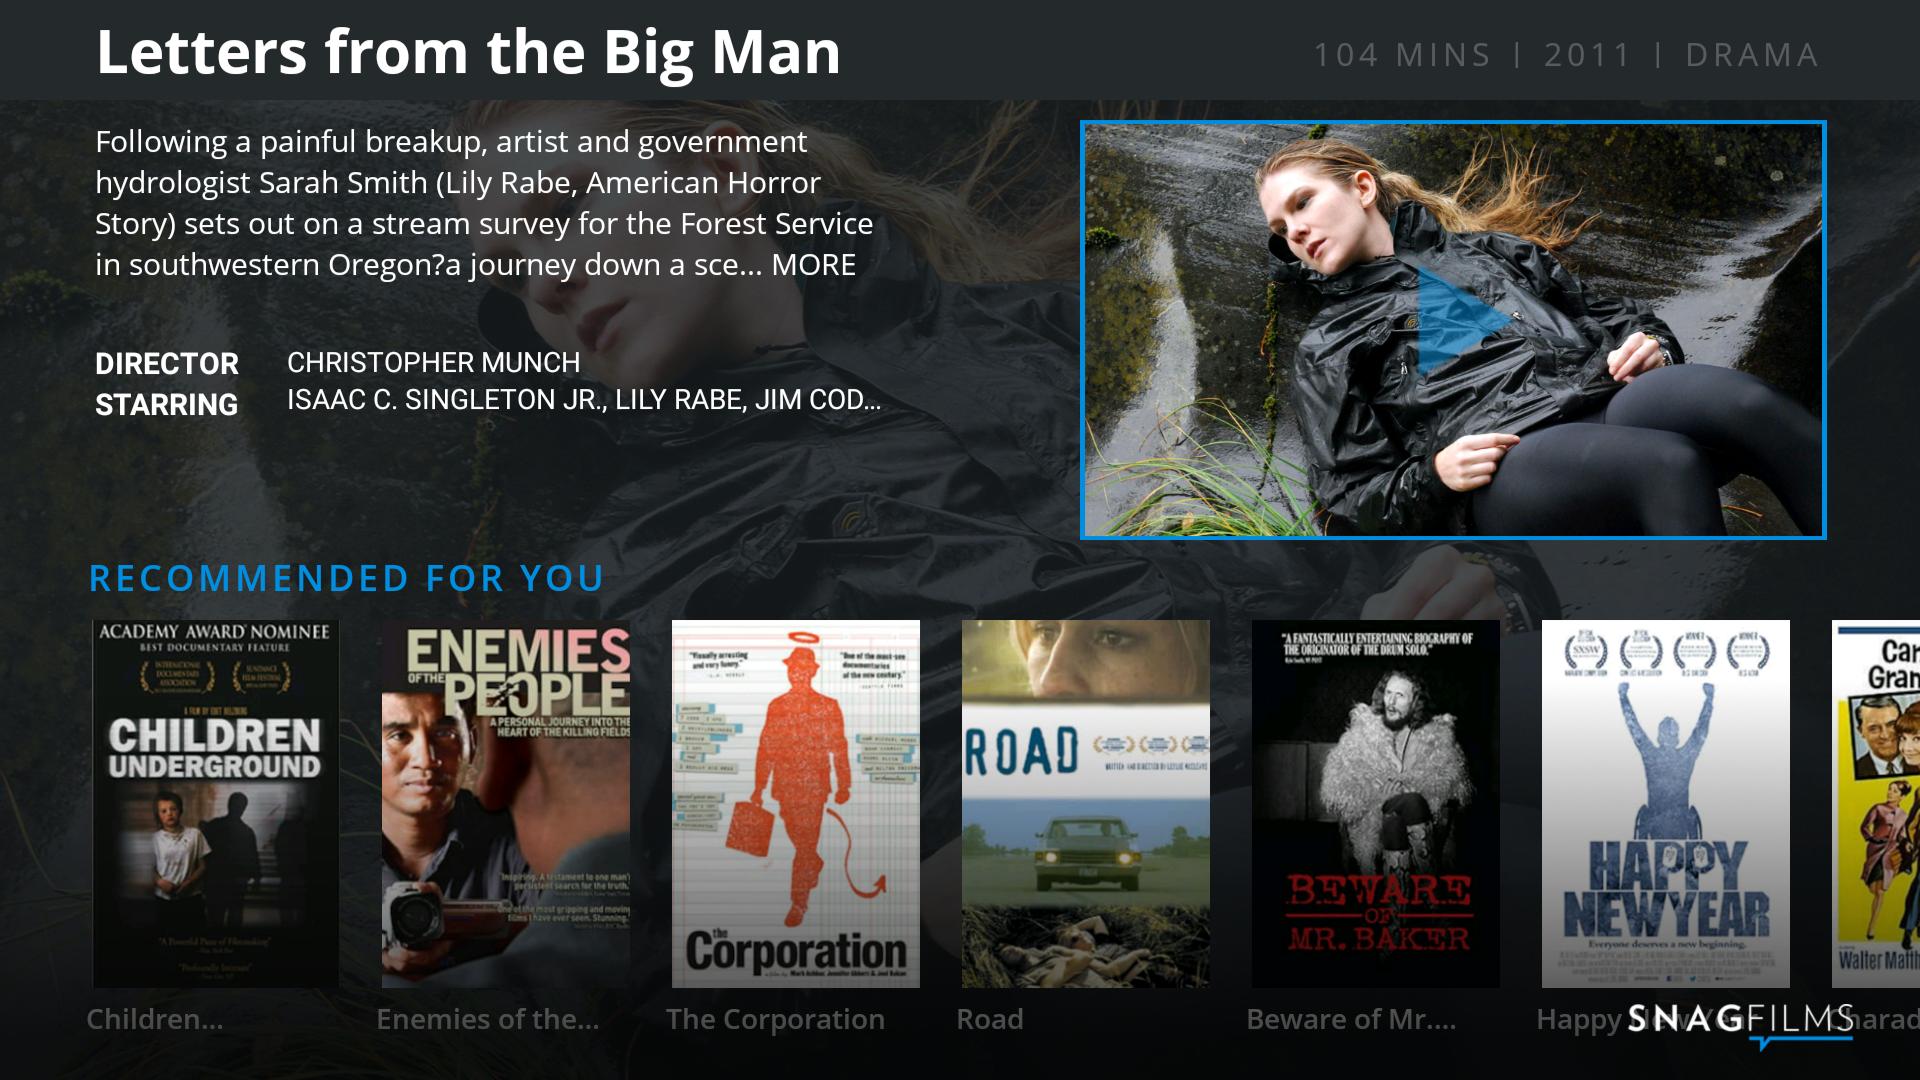 amazon com free movies